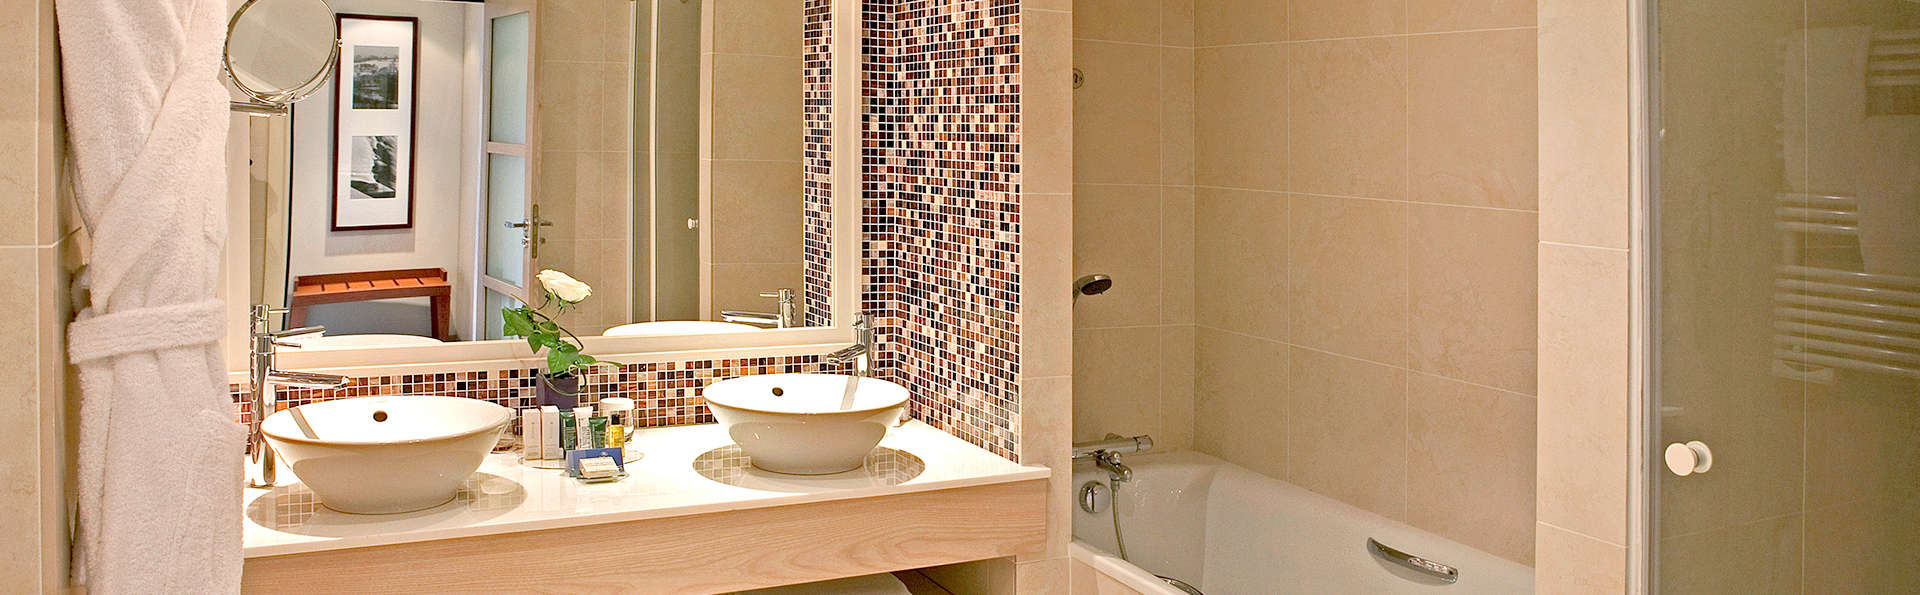 Hilton Évian les Bains - Edit_bath2.jpg